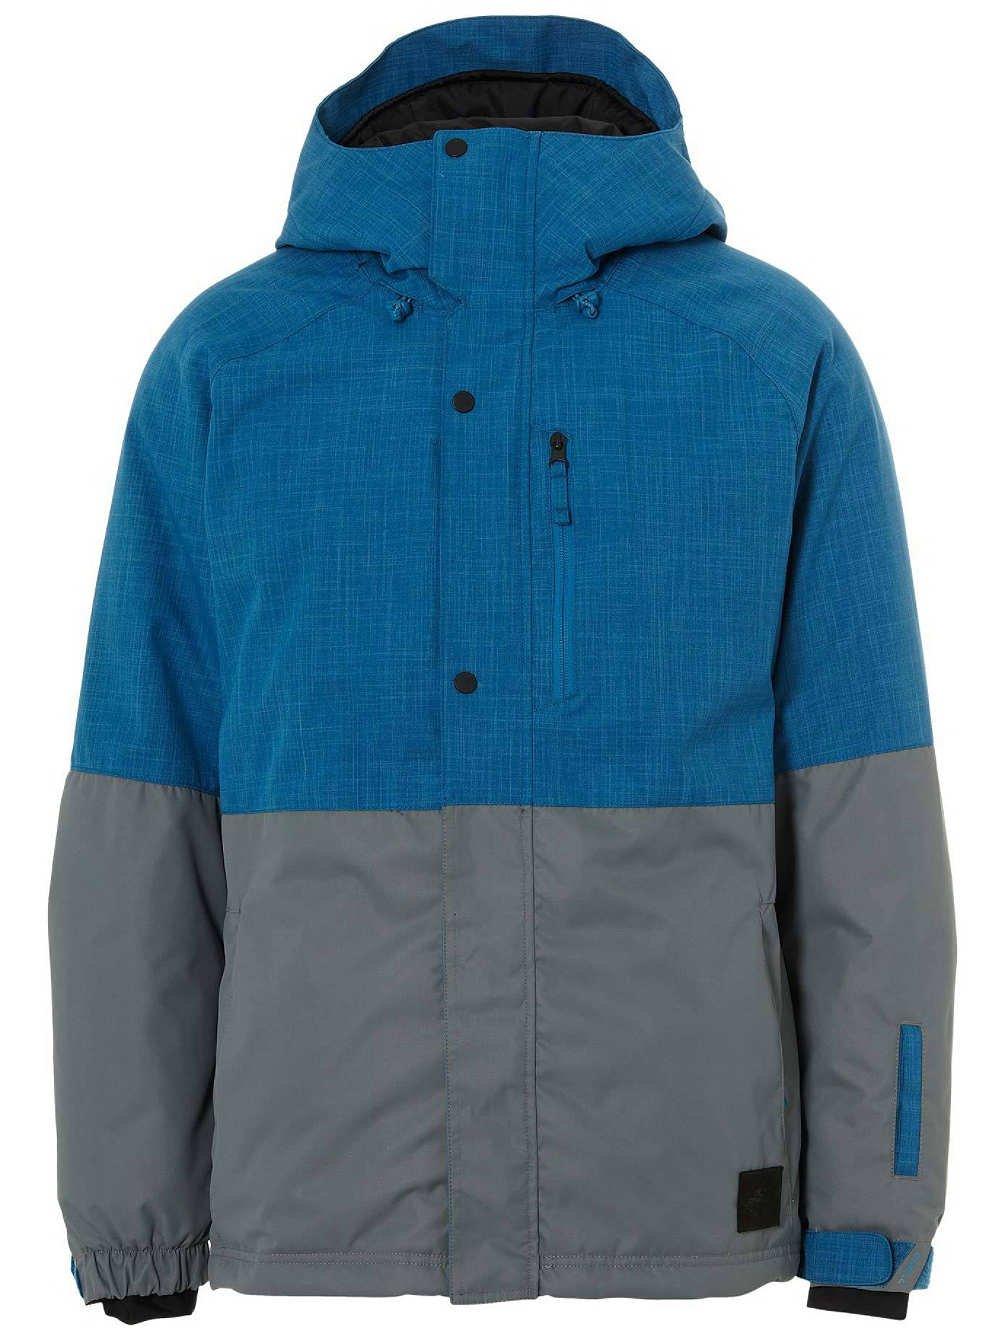 O'Neill Herren Skijacke PM Scene Jacket online kaufen